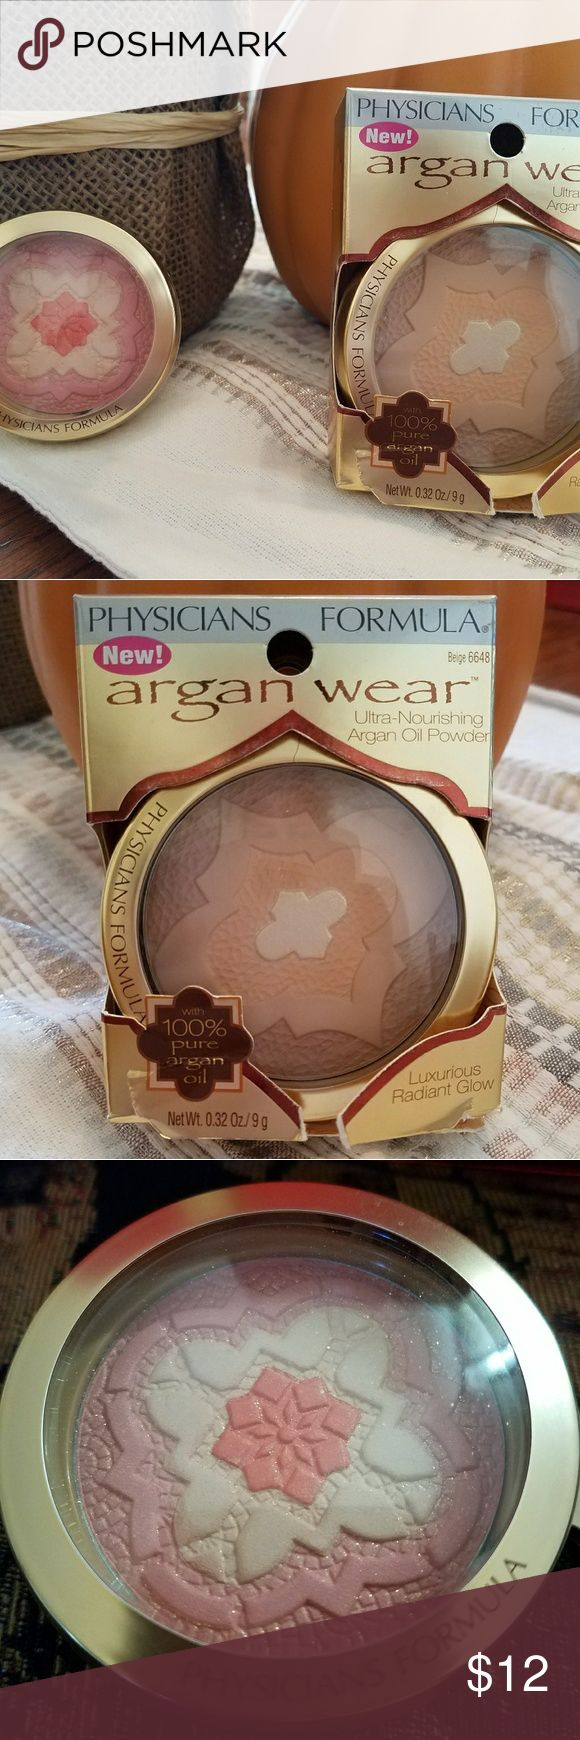 Physicians Formula Argan Wear Ultra nourishing argan oil powder- Beige 6648. NIP- package has rip Physicians Formula Makeup